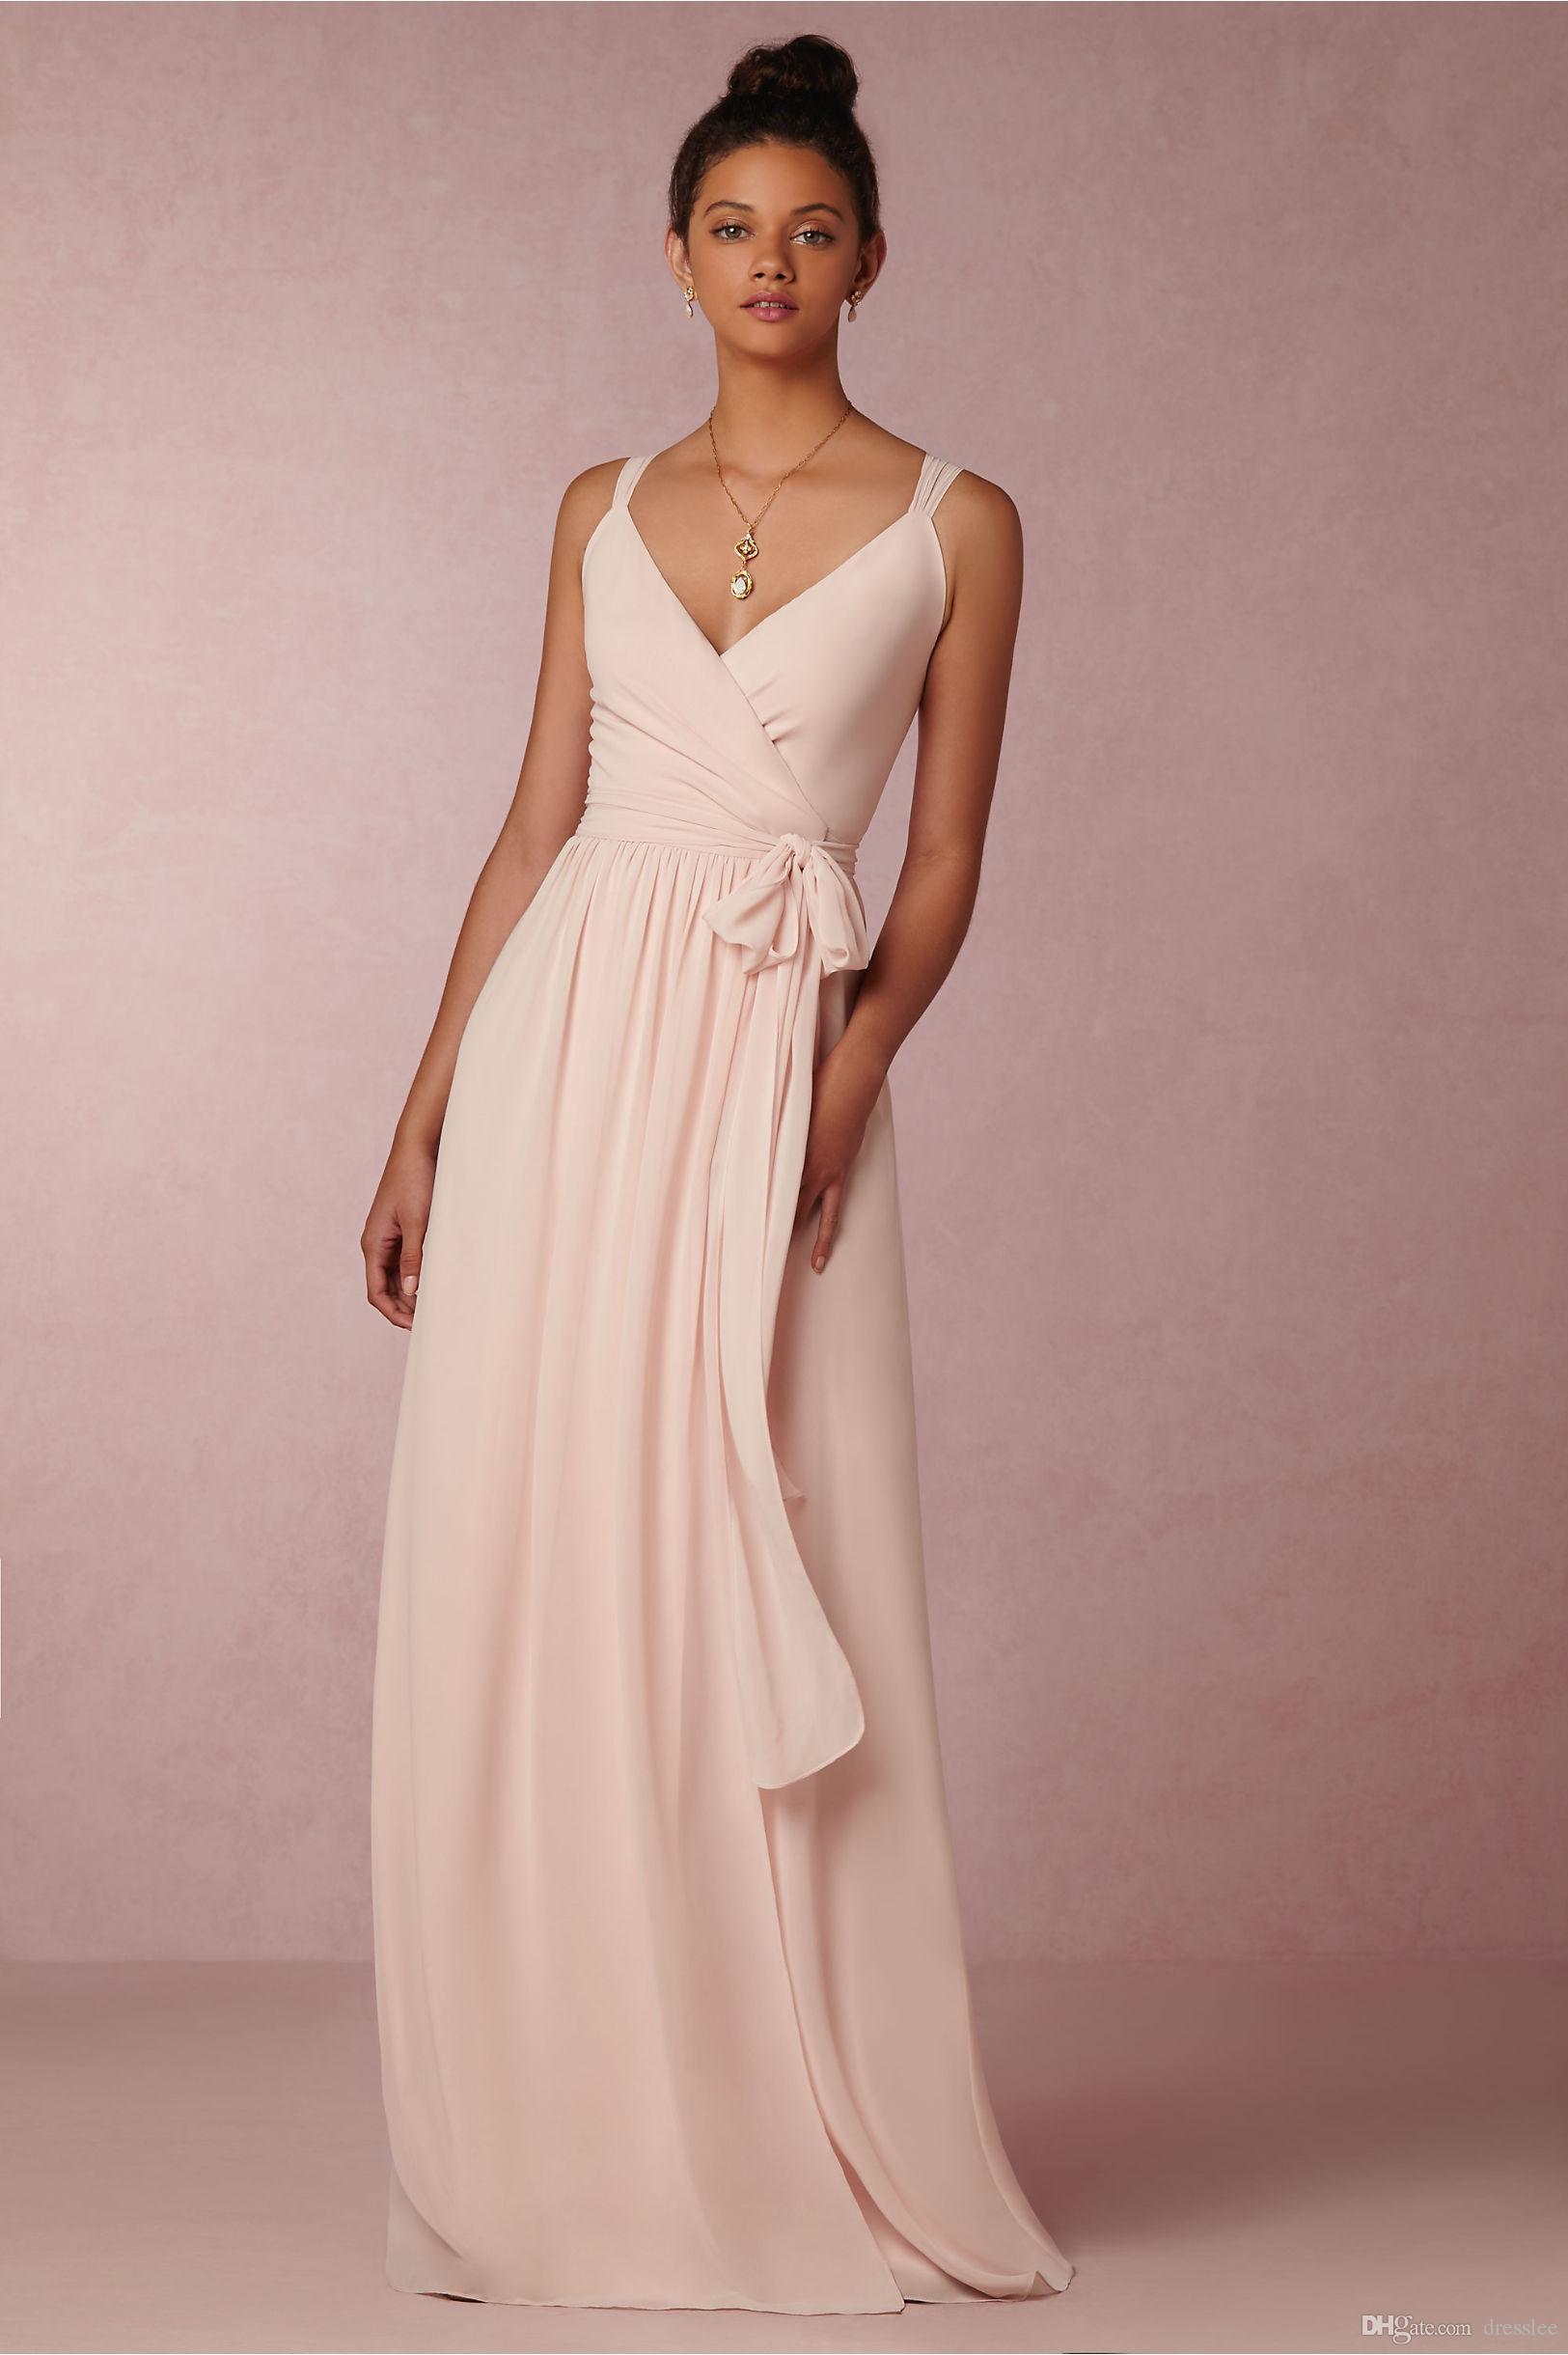 Vestidos Damas De Honor Blush Pink Bridesmiad Dresses Sheer ...